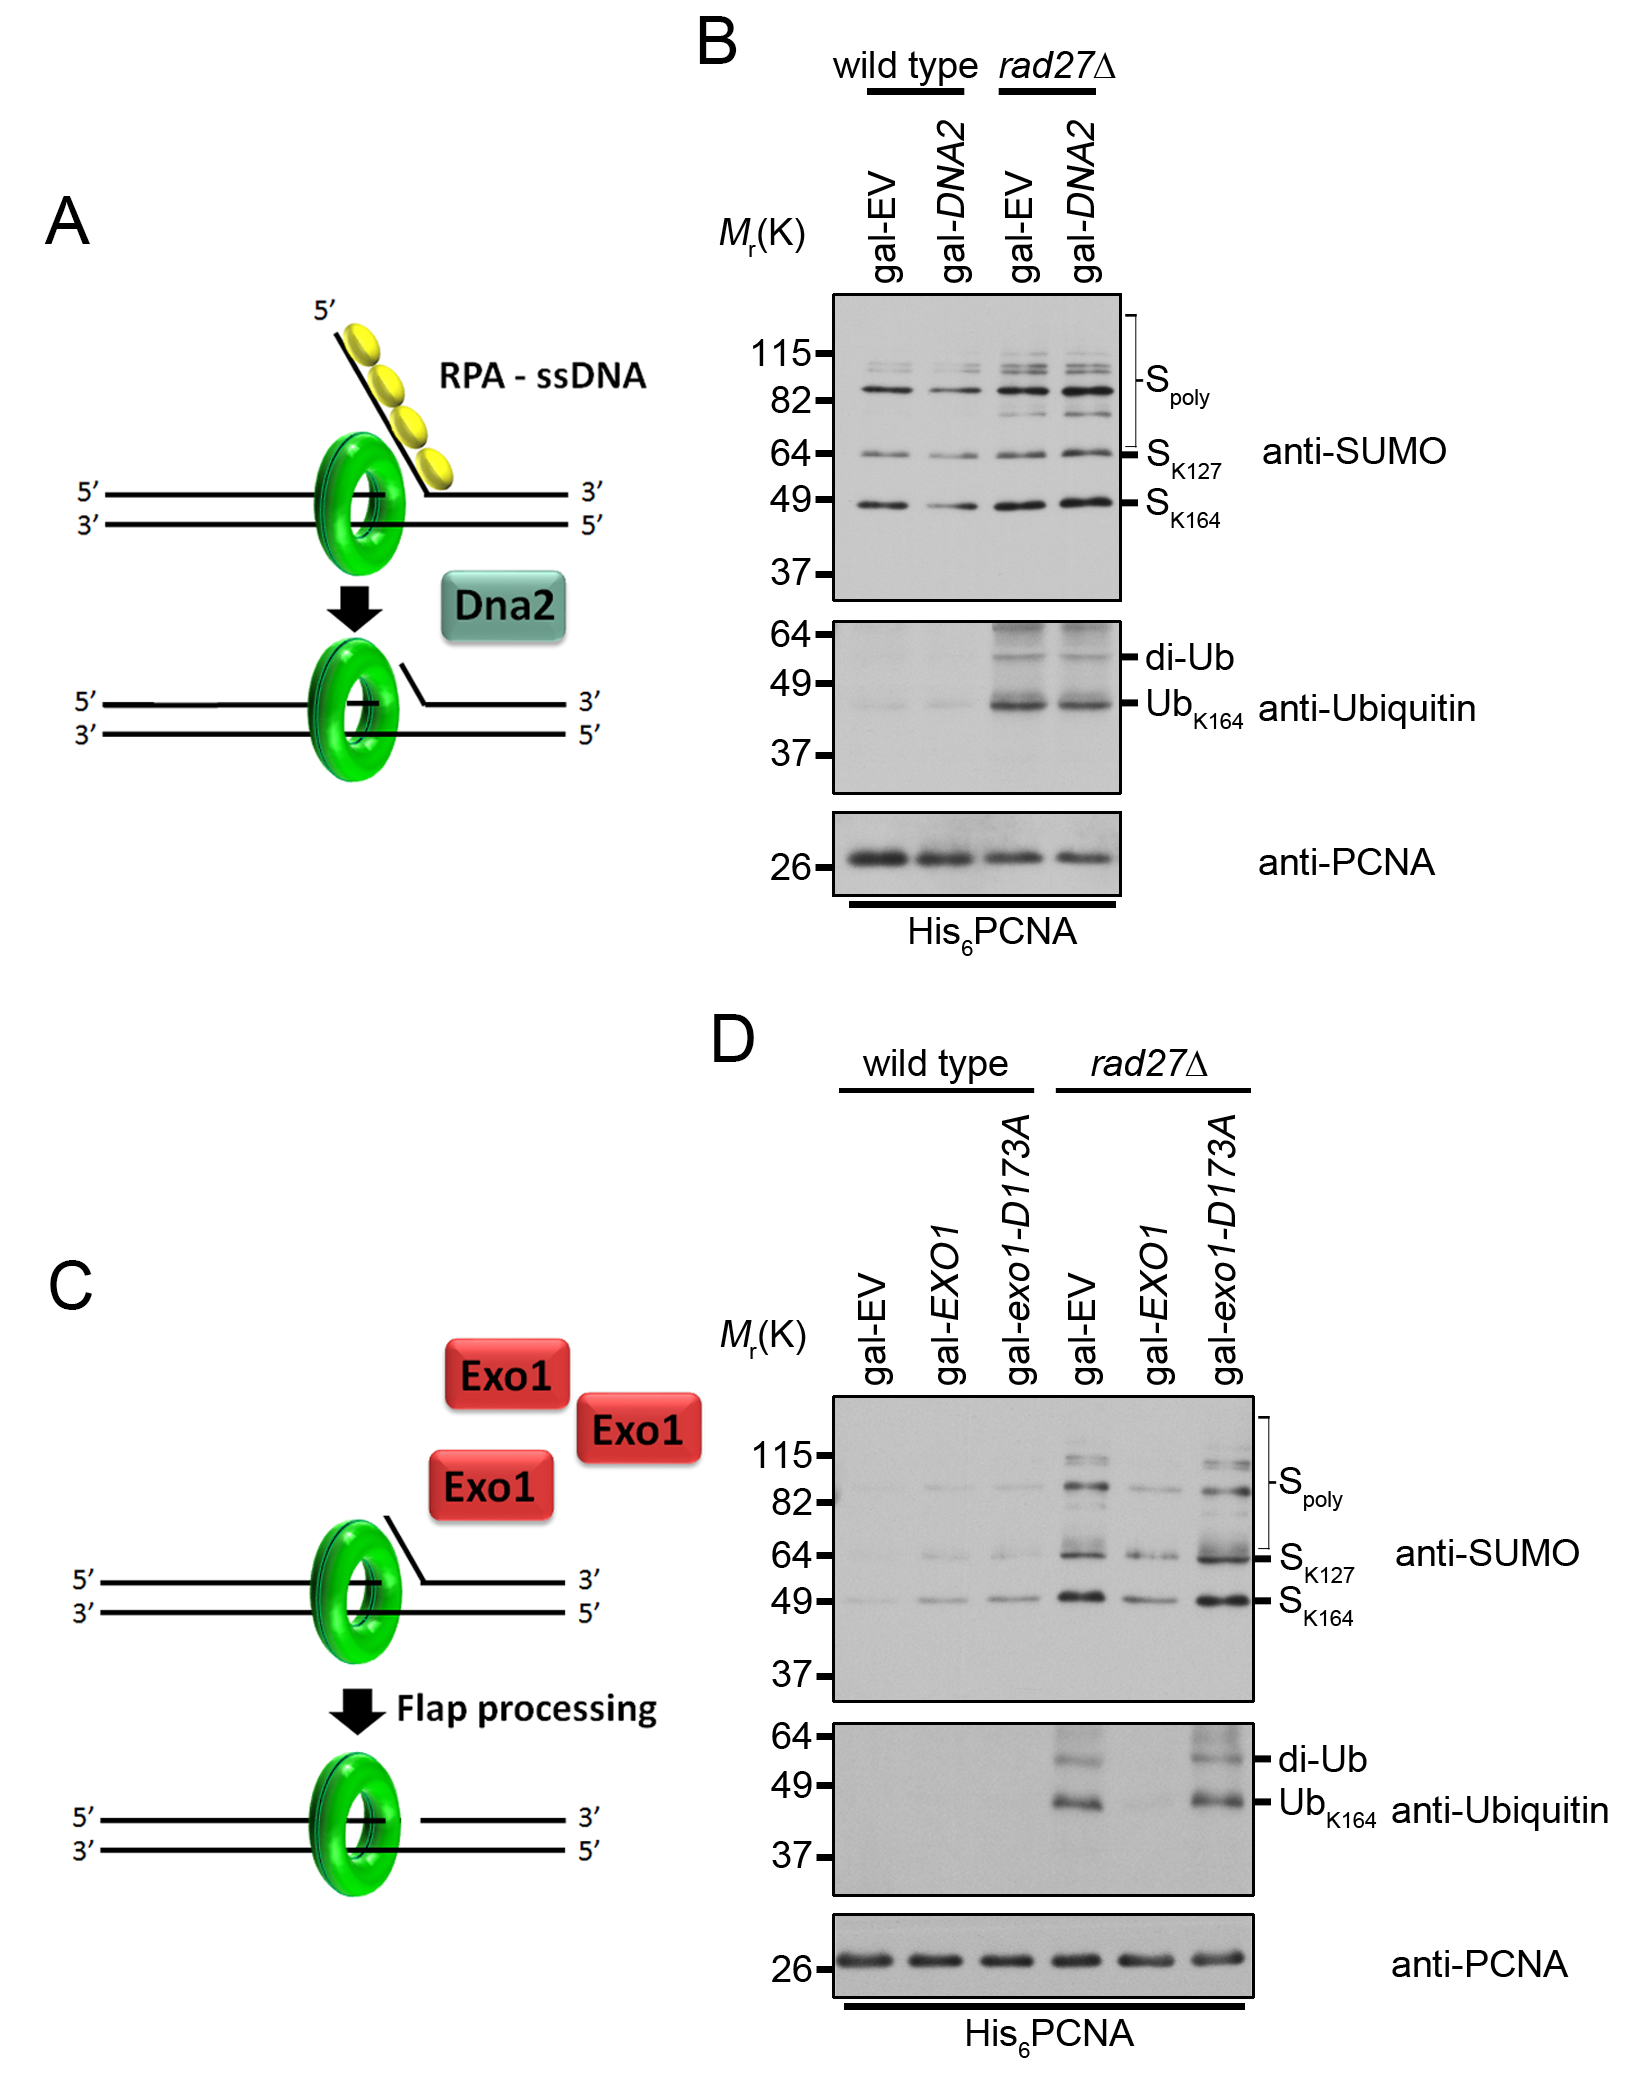 Overexpression of <i>EXO1</i> suppresses PCNA ubiquitination in <i>rad27Δ</i>.